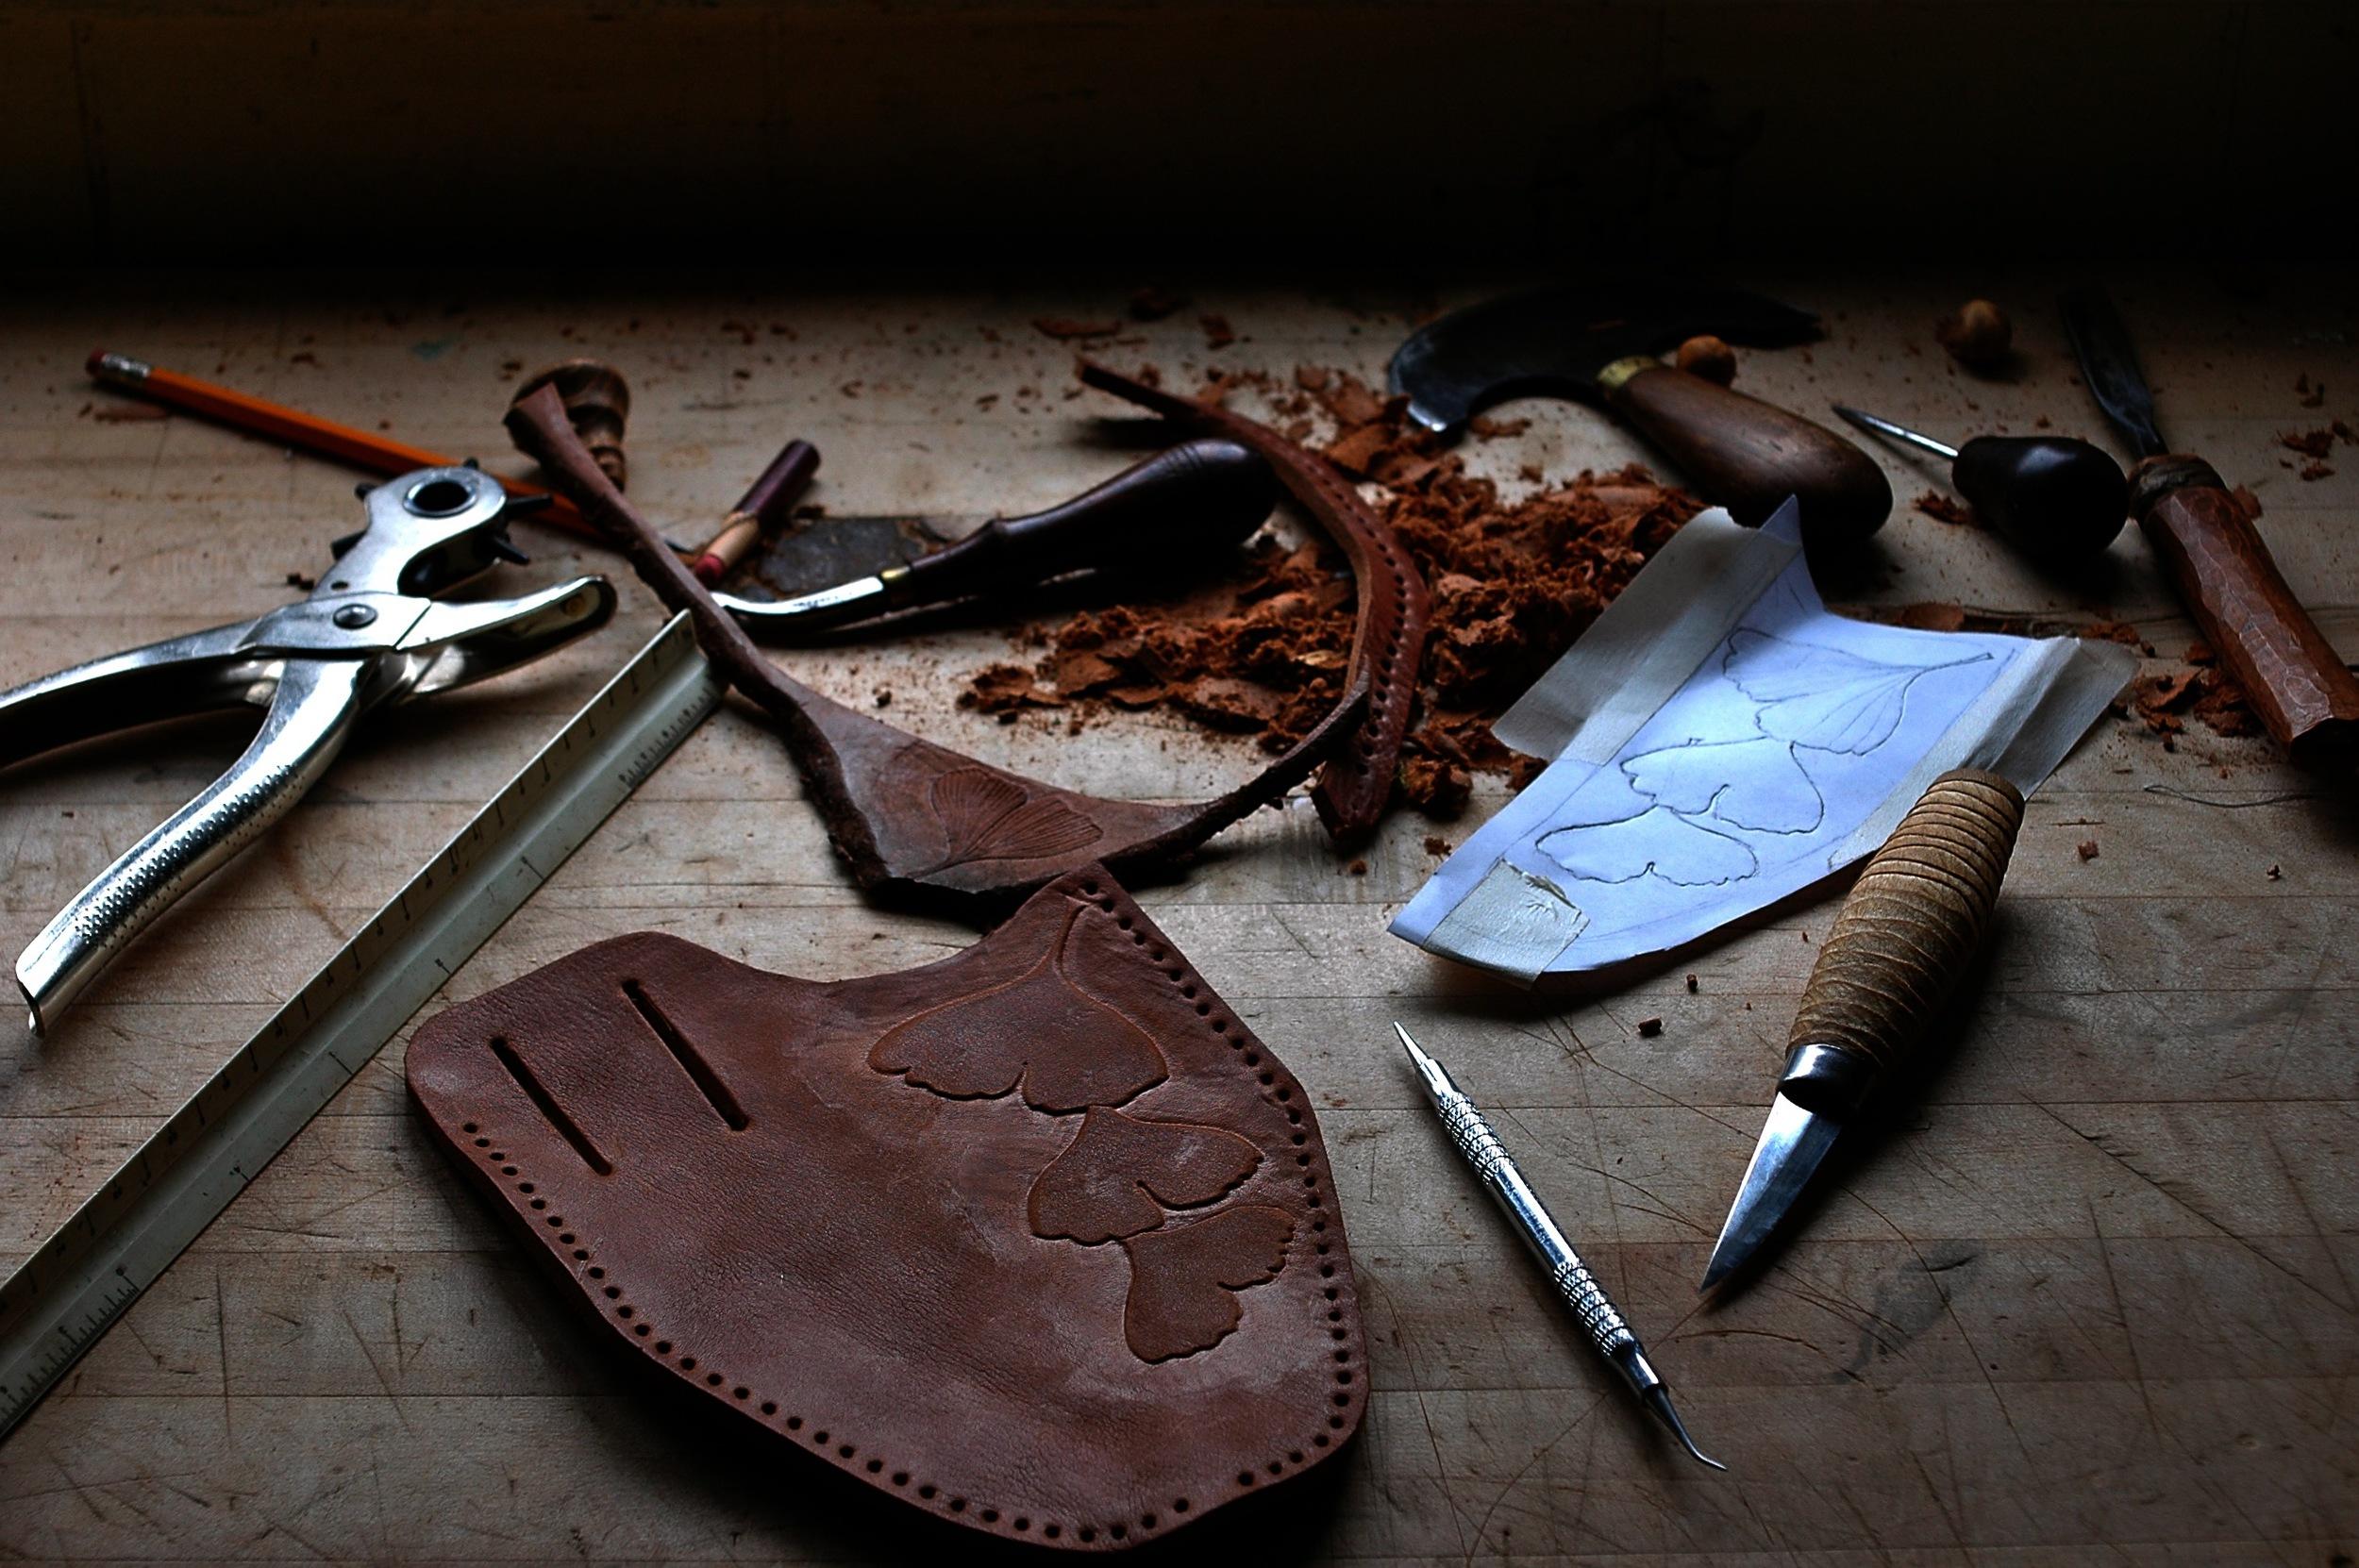 Bark tanned bull leather pruner sheath in progress.